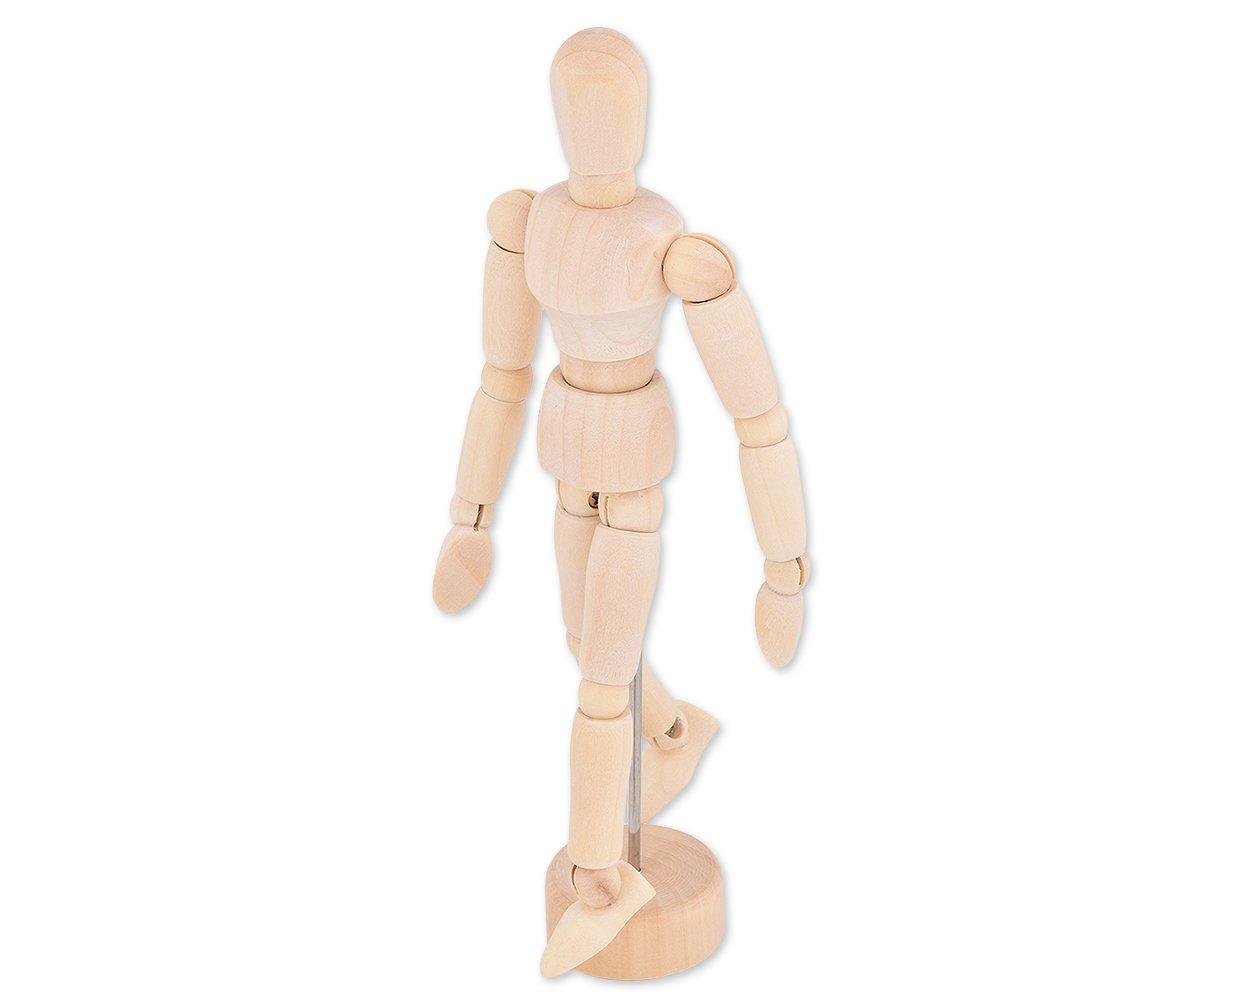 Ace Select 14cm Wooden Movable Manikin Adjustable Artist Mannequin Dummy Model